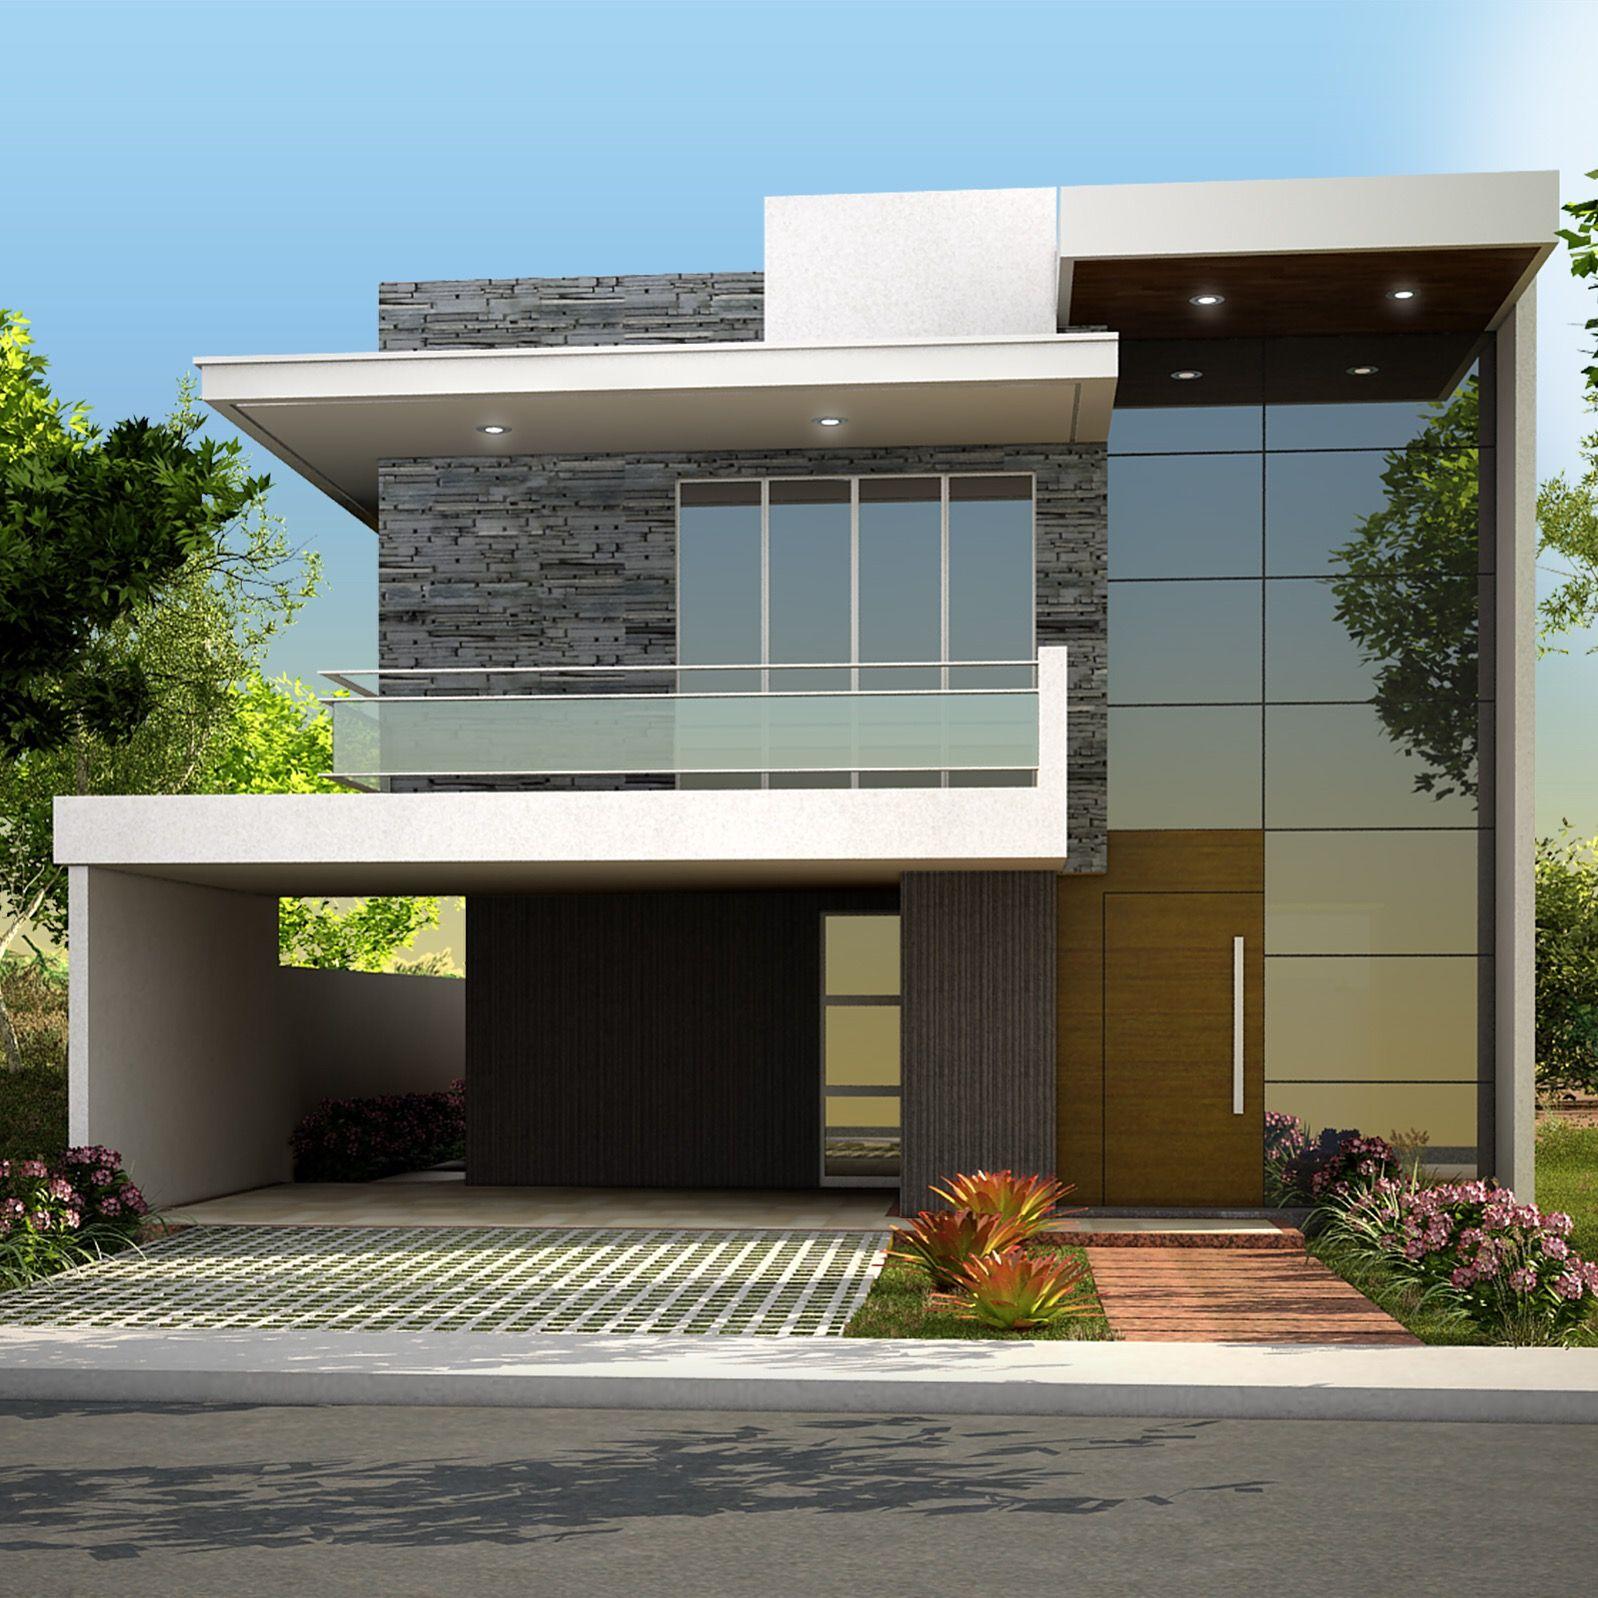 Fachada chilca arquitectura en 2019 casas modernas for Viviendas estilo minimalista